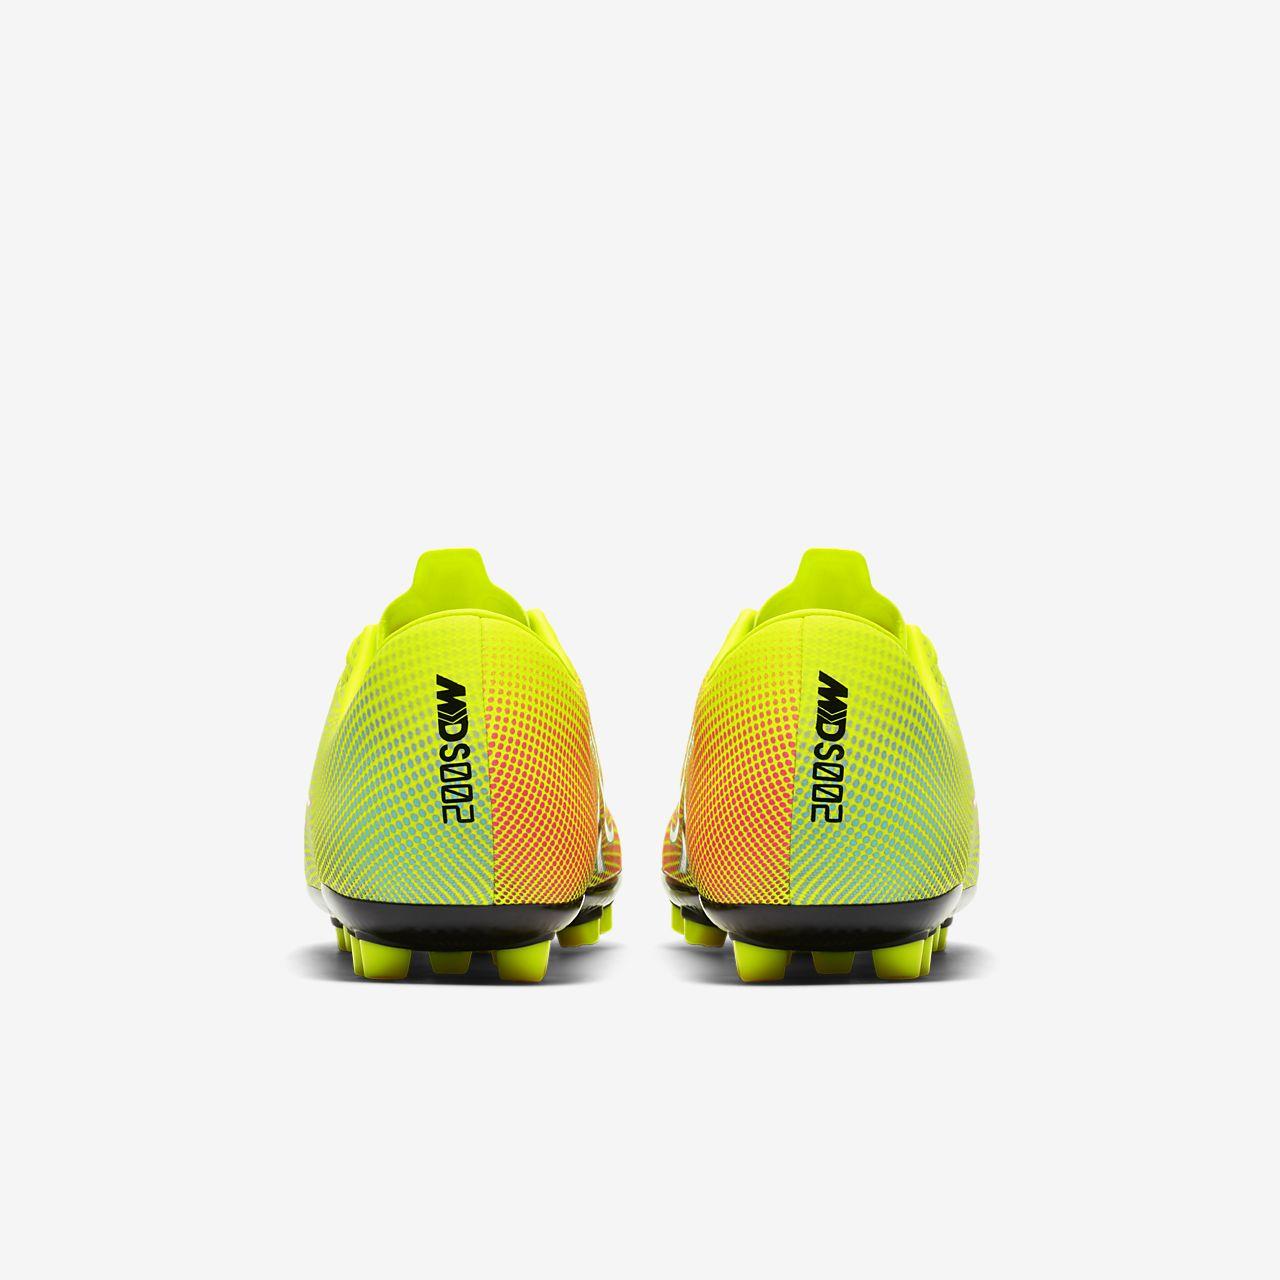 Chaussure de football à crampons pour terrain synthétique Nike Mercurial Vapor 13 Academy MDS AG